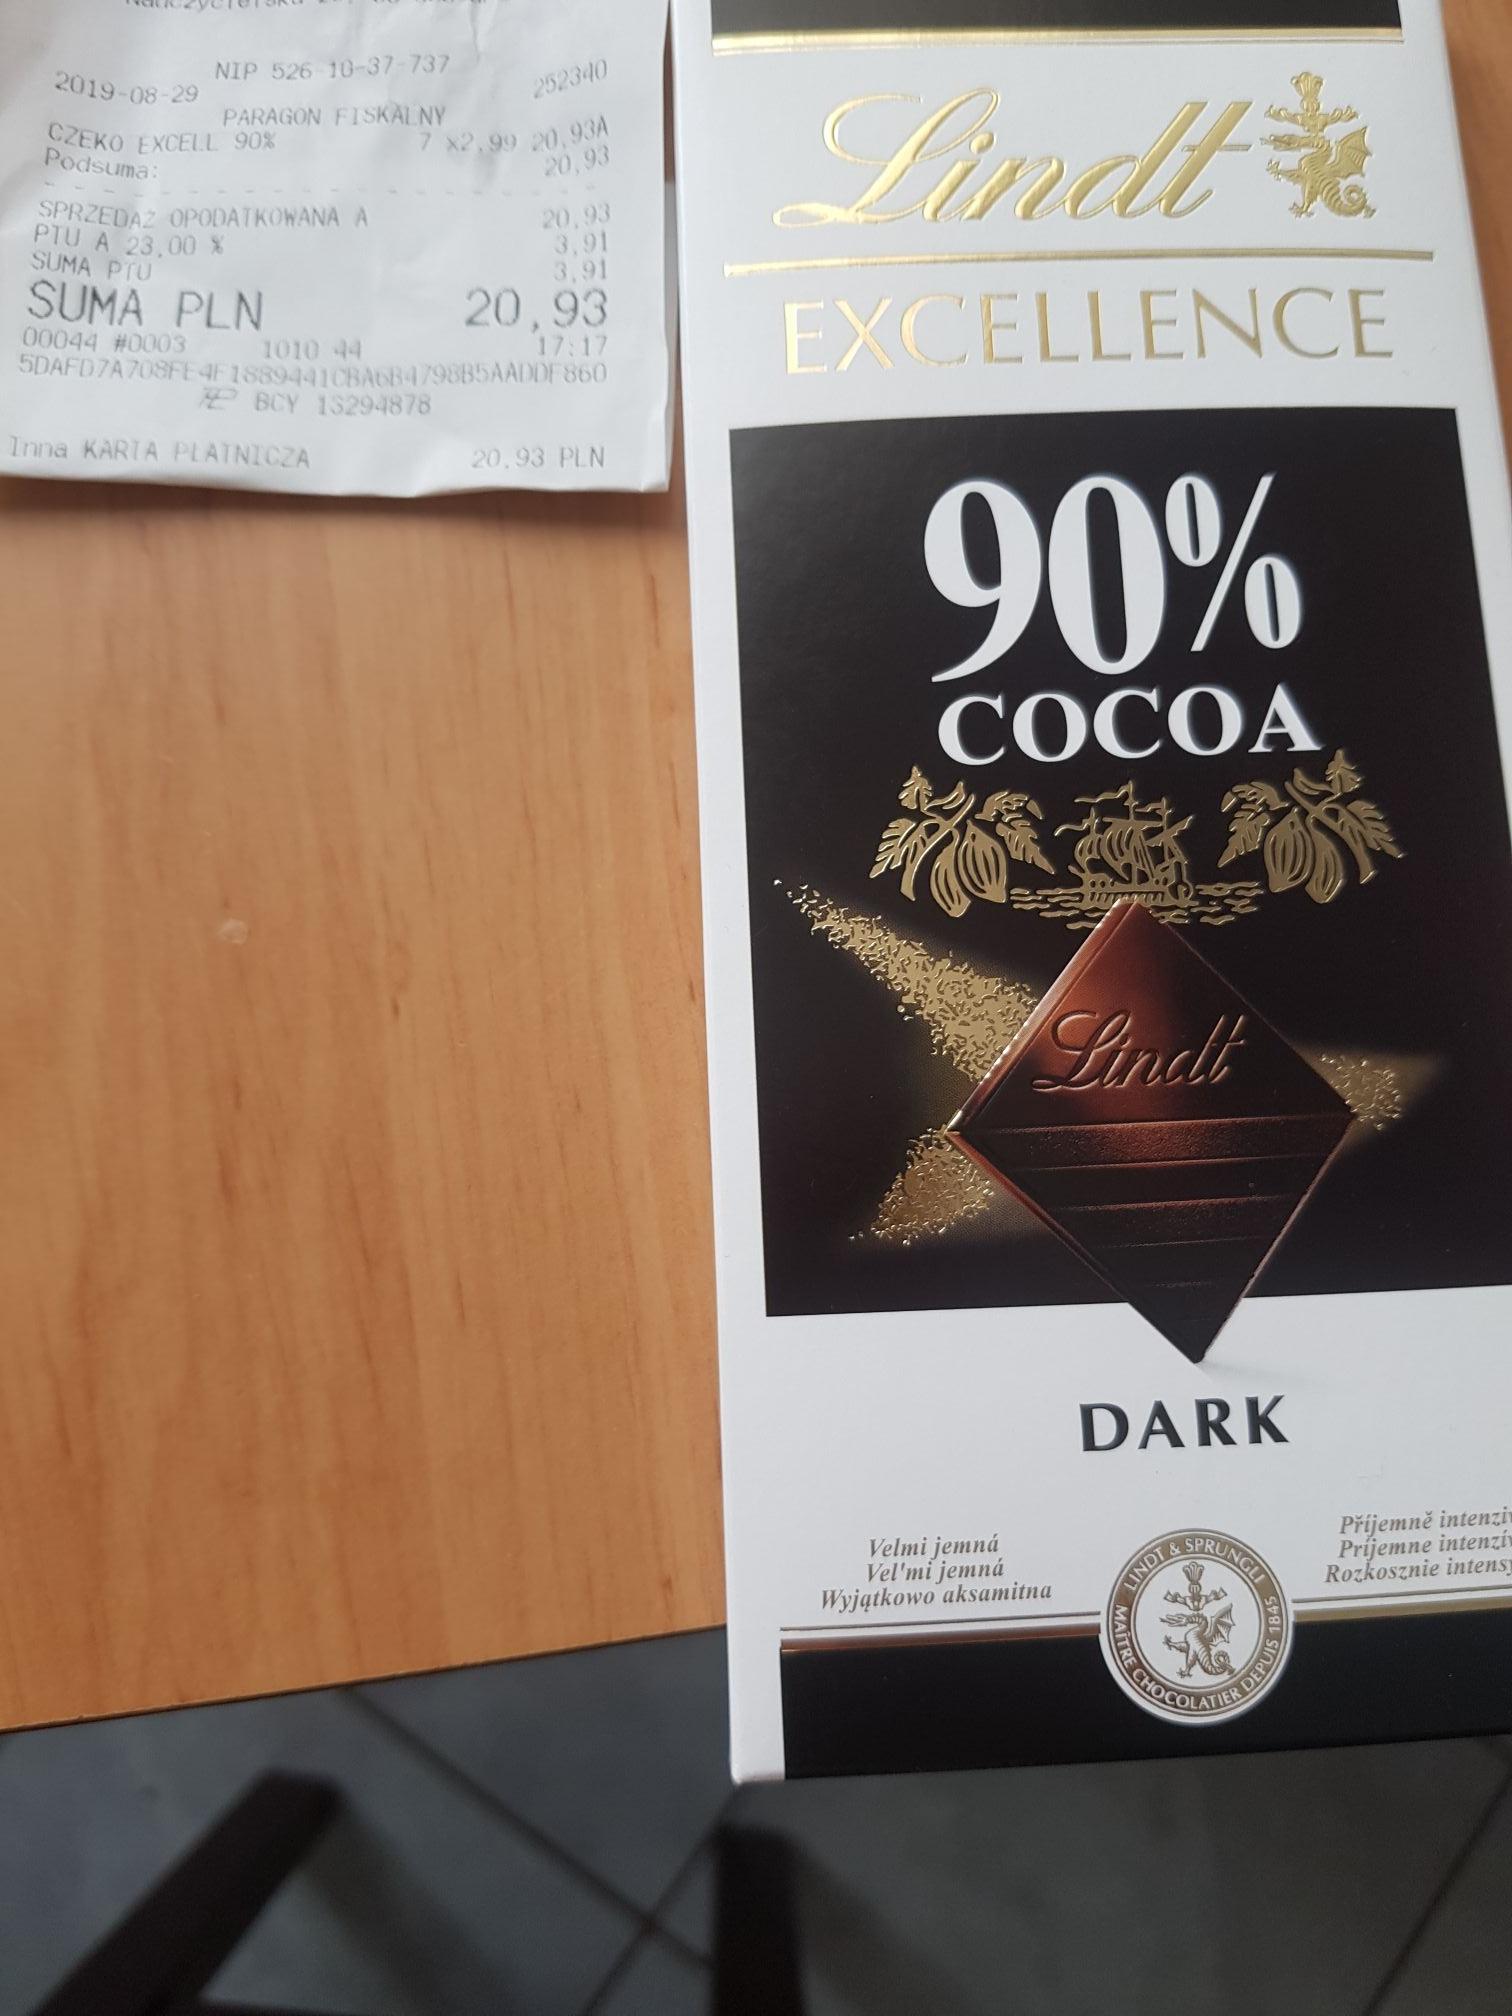 Czekolada  Lindt Excellence 90% Cocoa Tesco Supermarket